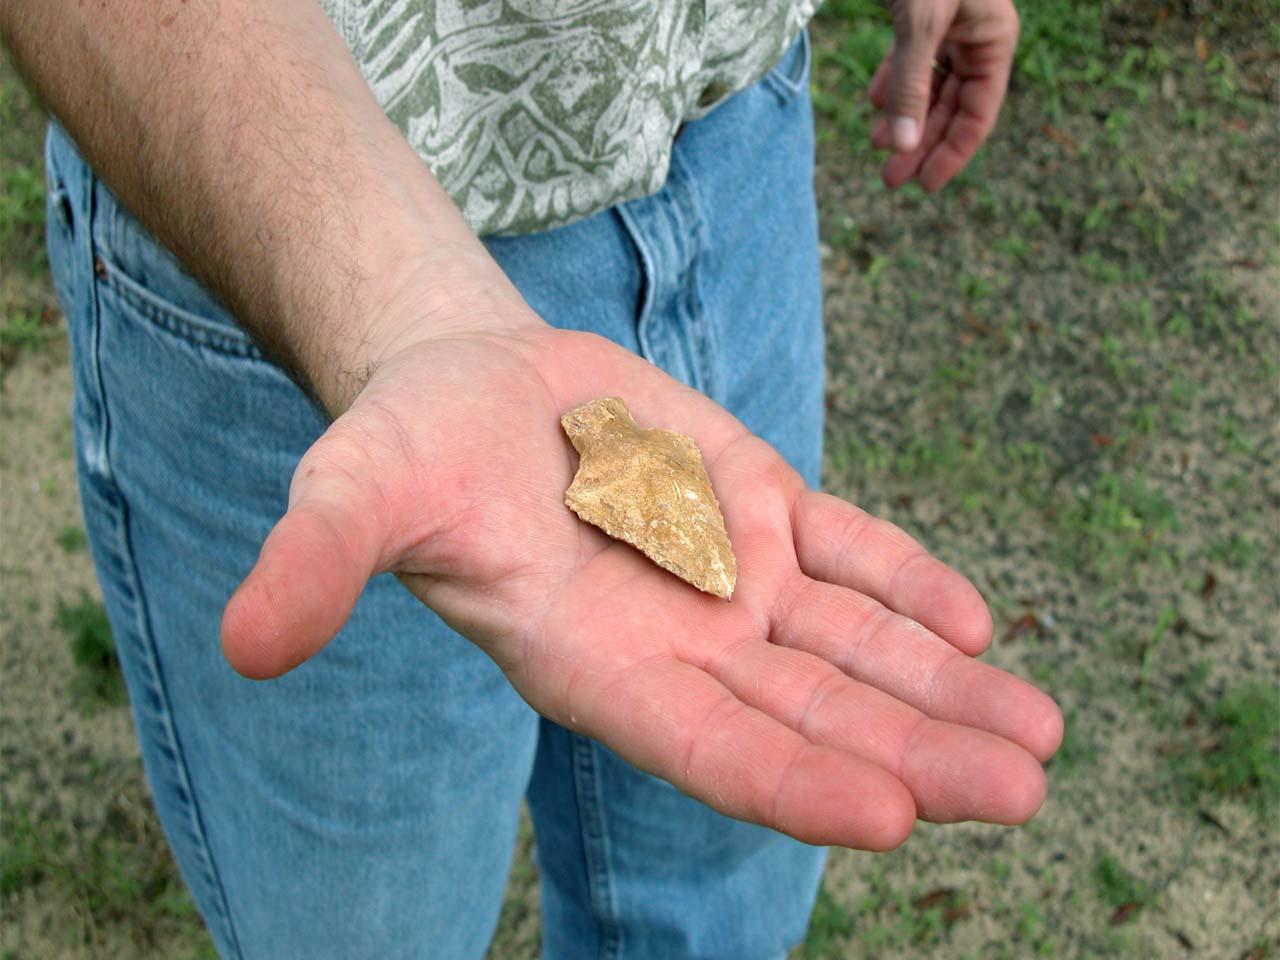 Forrest Fenn Hidden Treasure, treasures, life, people, fact, facts, arrow, history, ancient